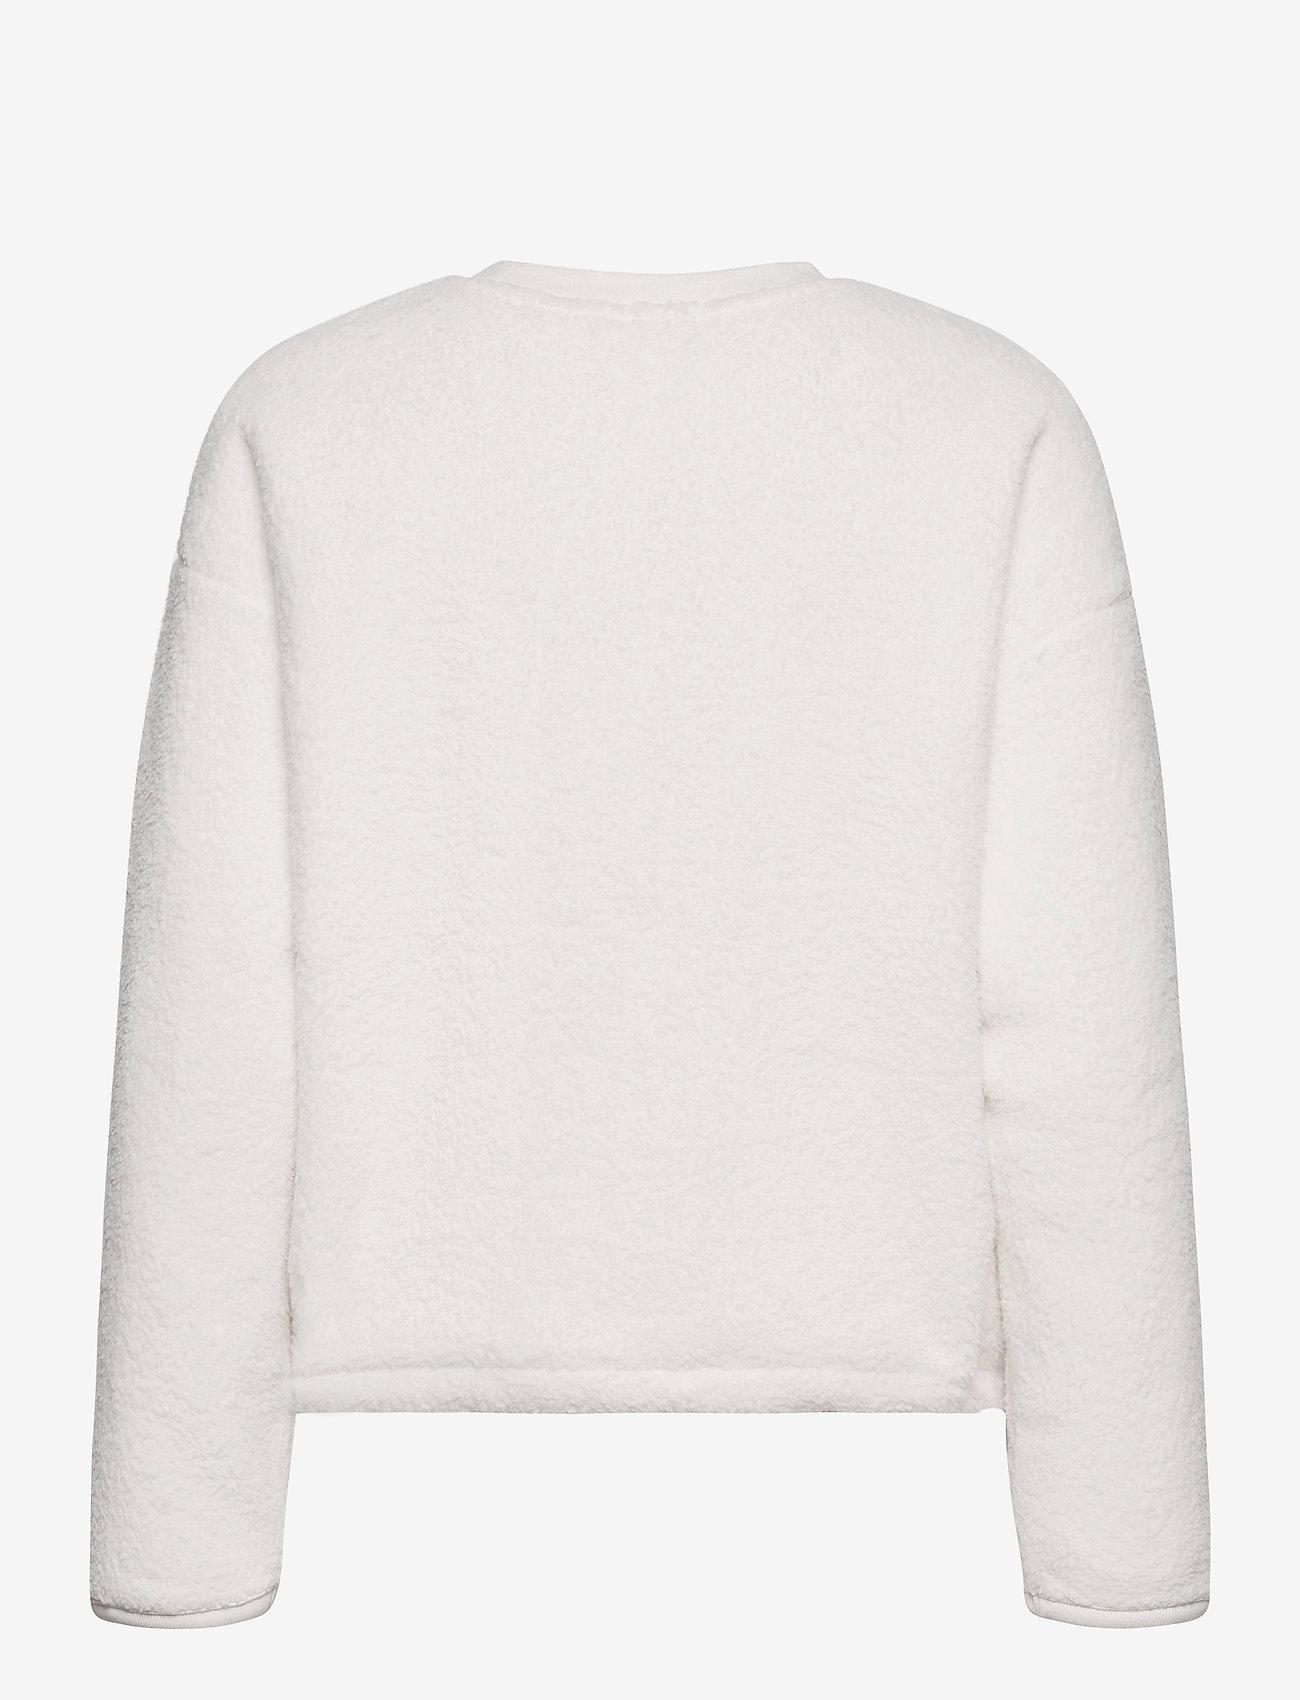 GAP - GAP SHERPA PO CR - sweatshirts - milk 600 global - 1